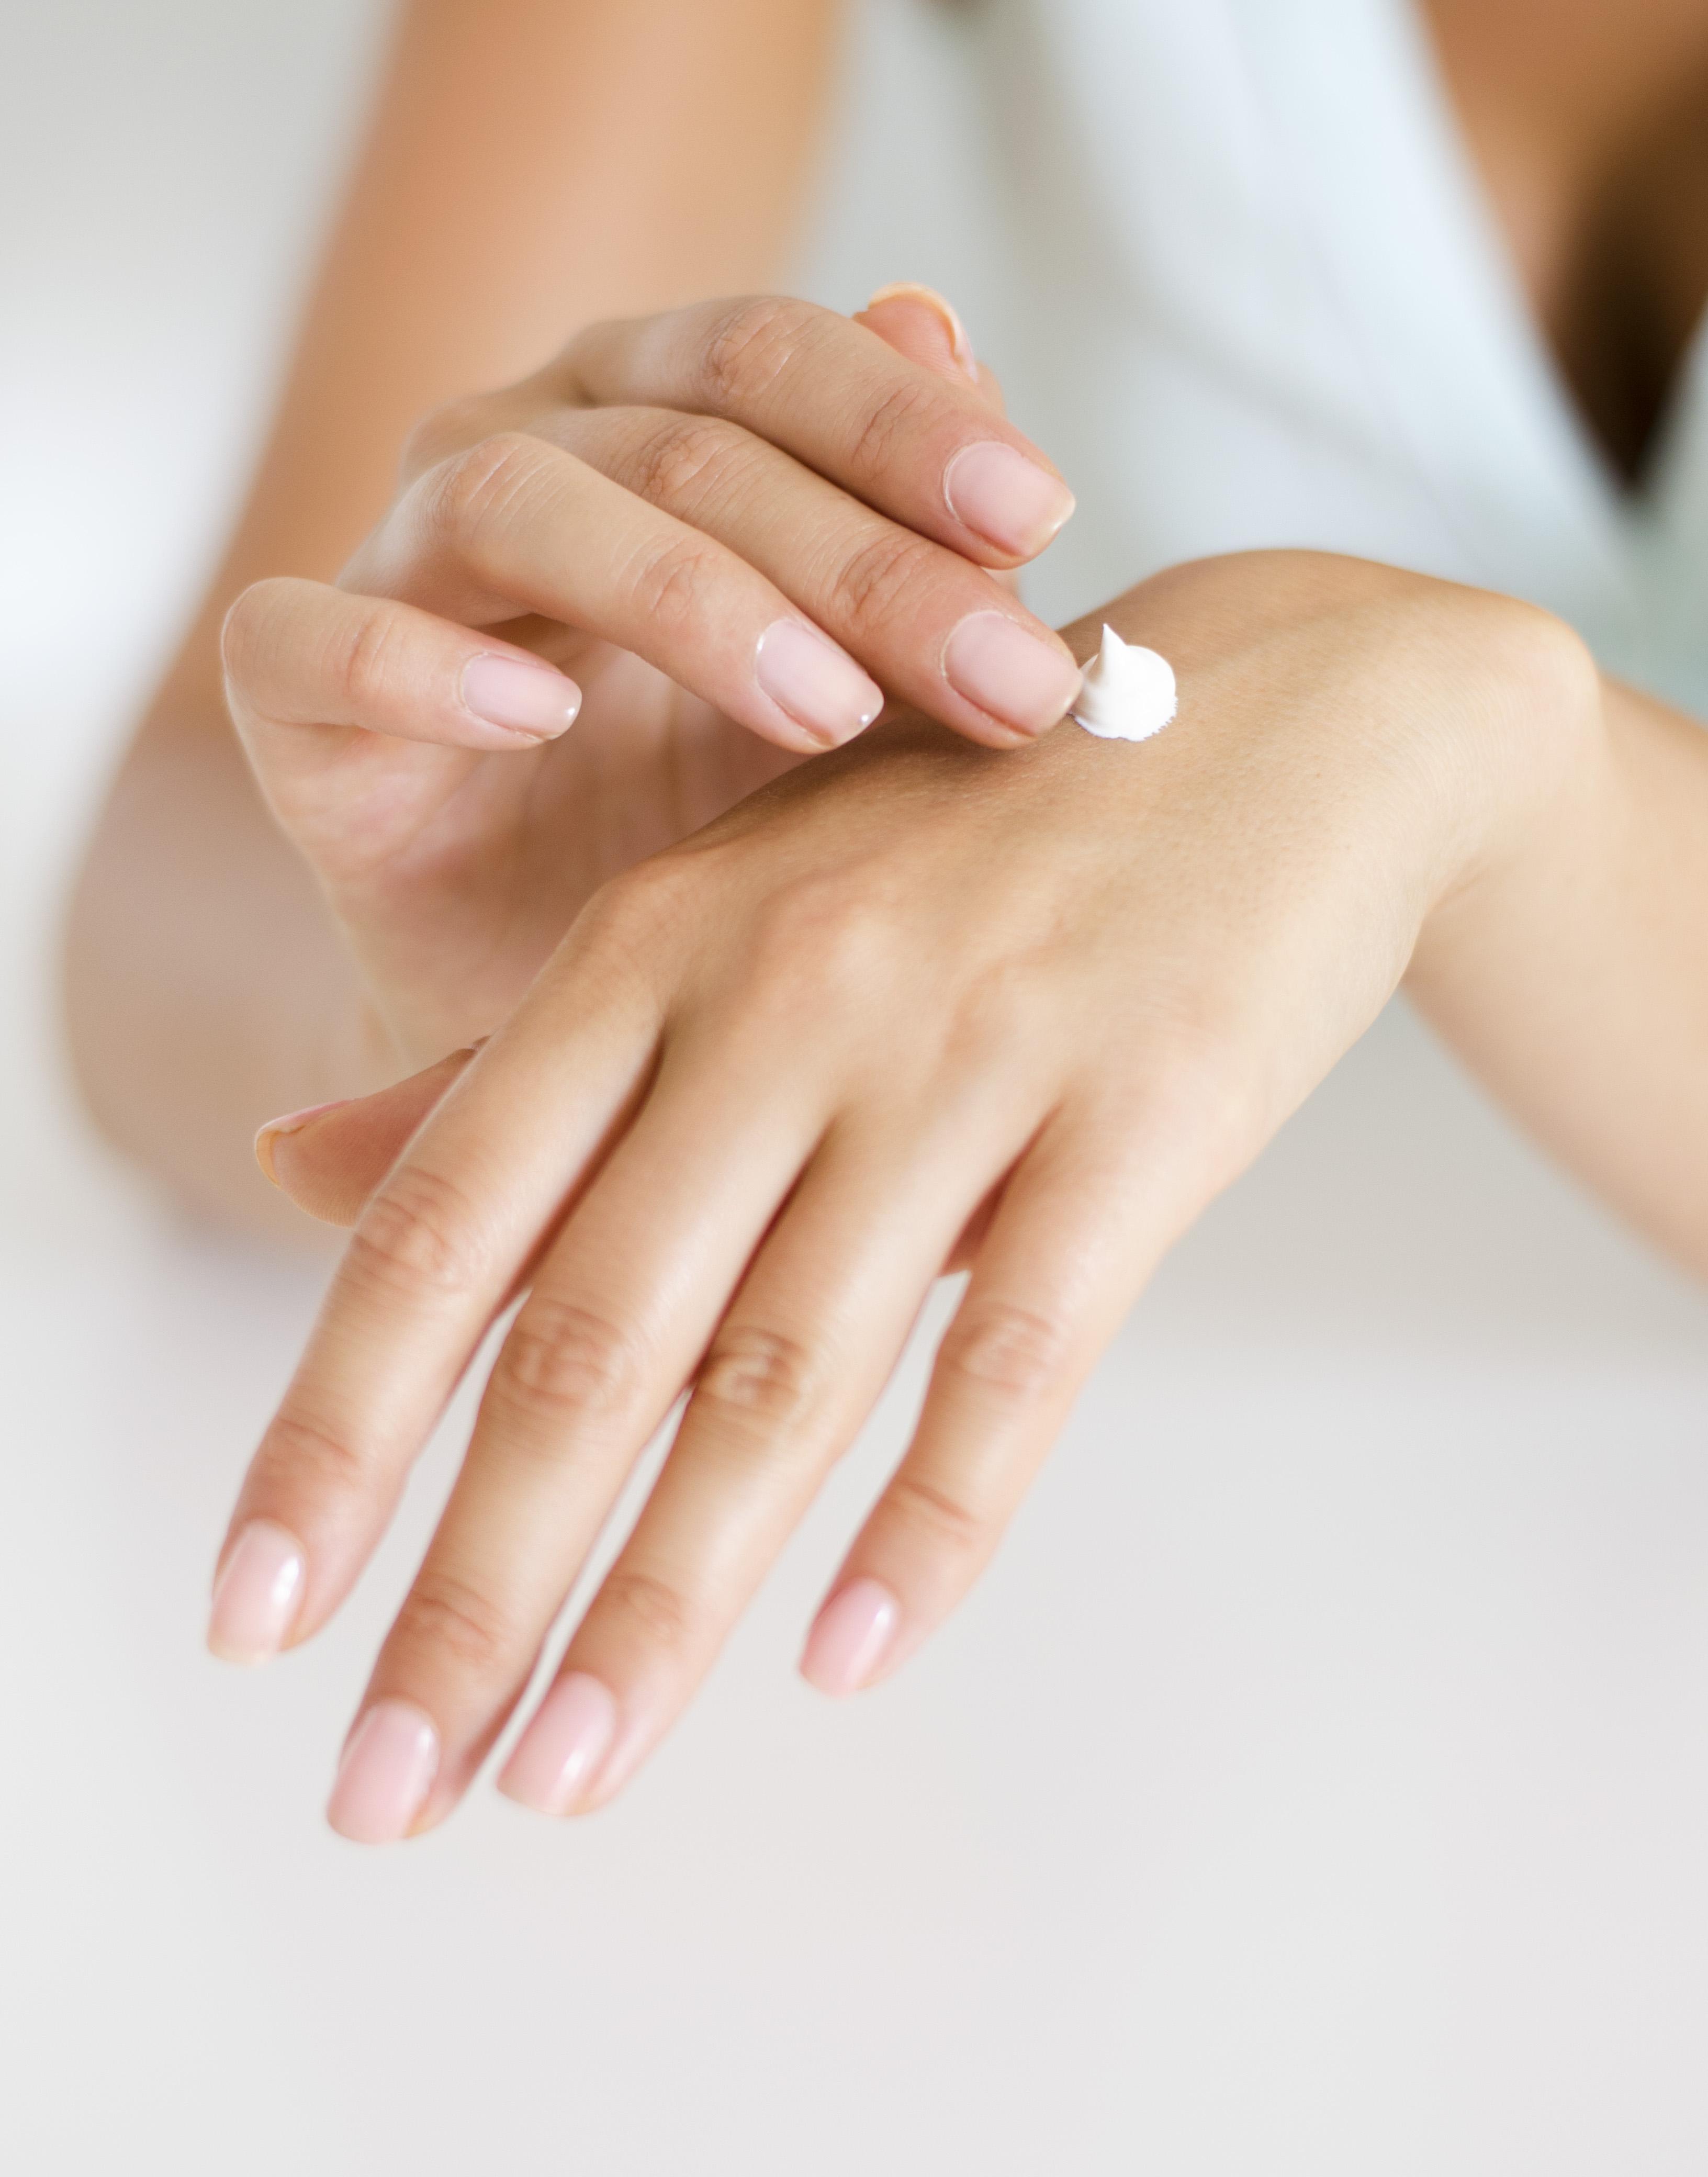 Western Medicine's approach to Eczema (Atopic Dermatitis)